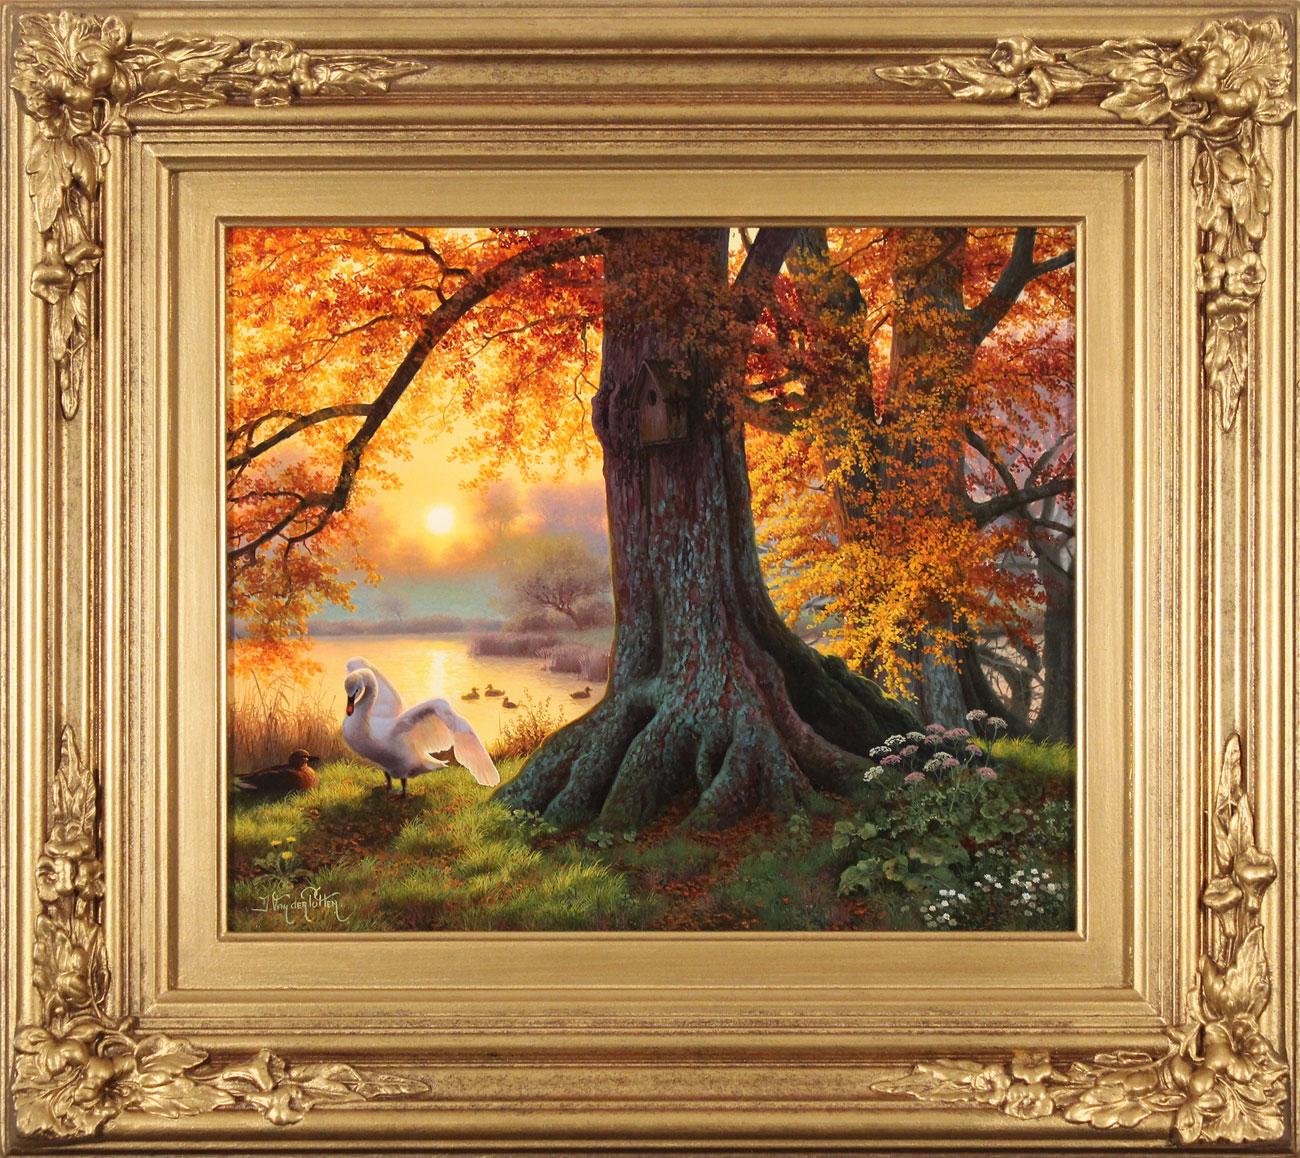 Daniel Van Der Putten, Original oil painting on panel, Autumn Evening Light, Silsden, Keighley, Yorkshire. Click to enlarge